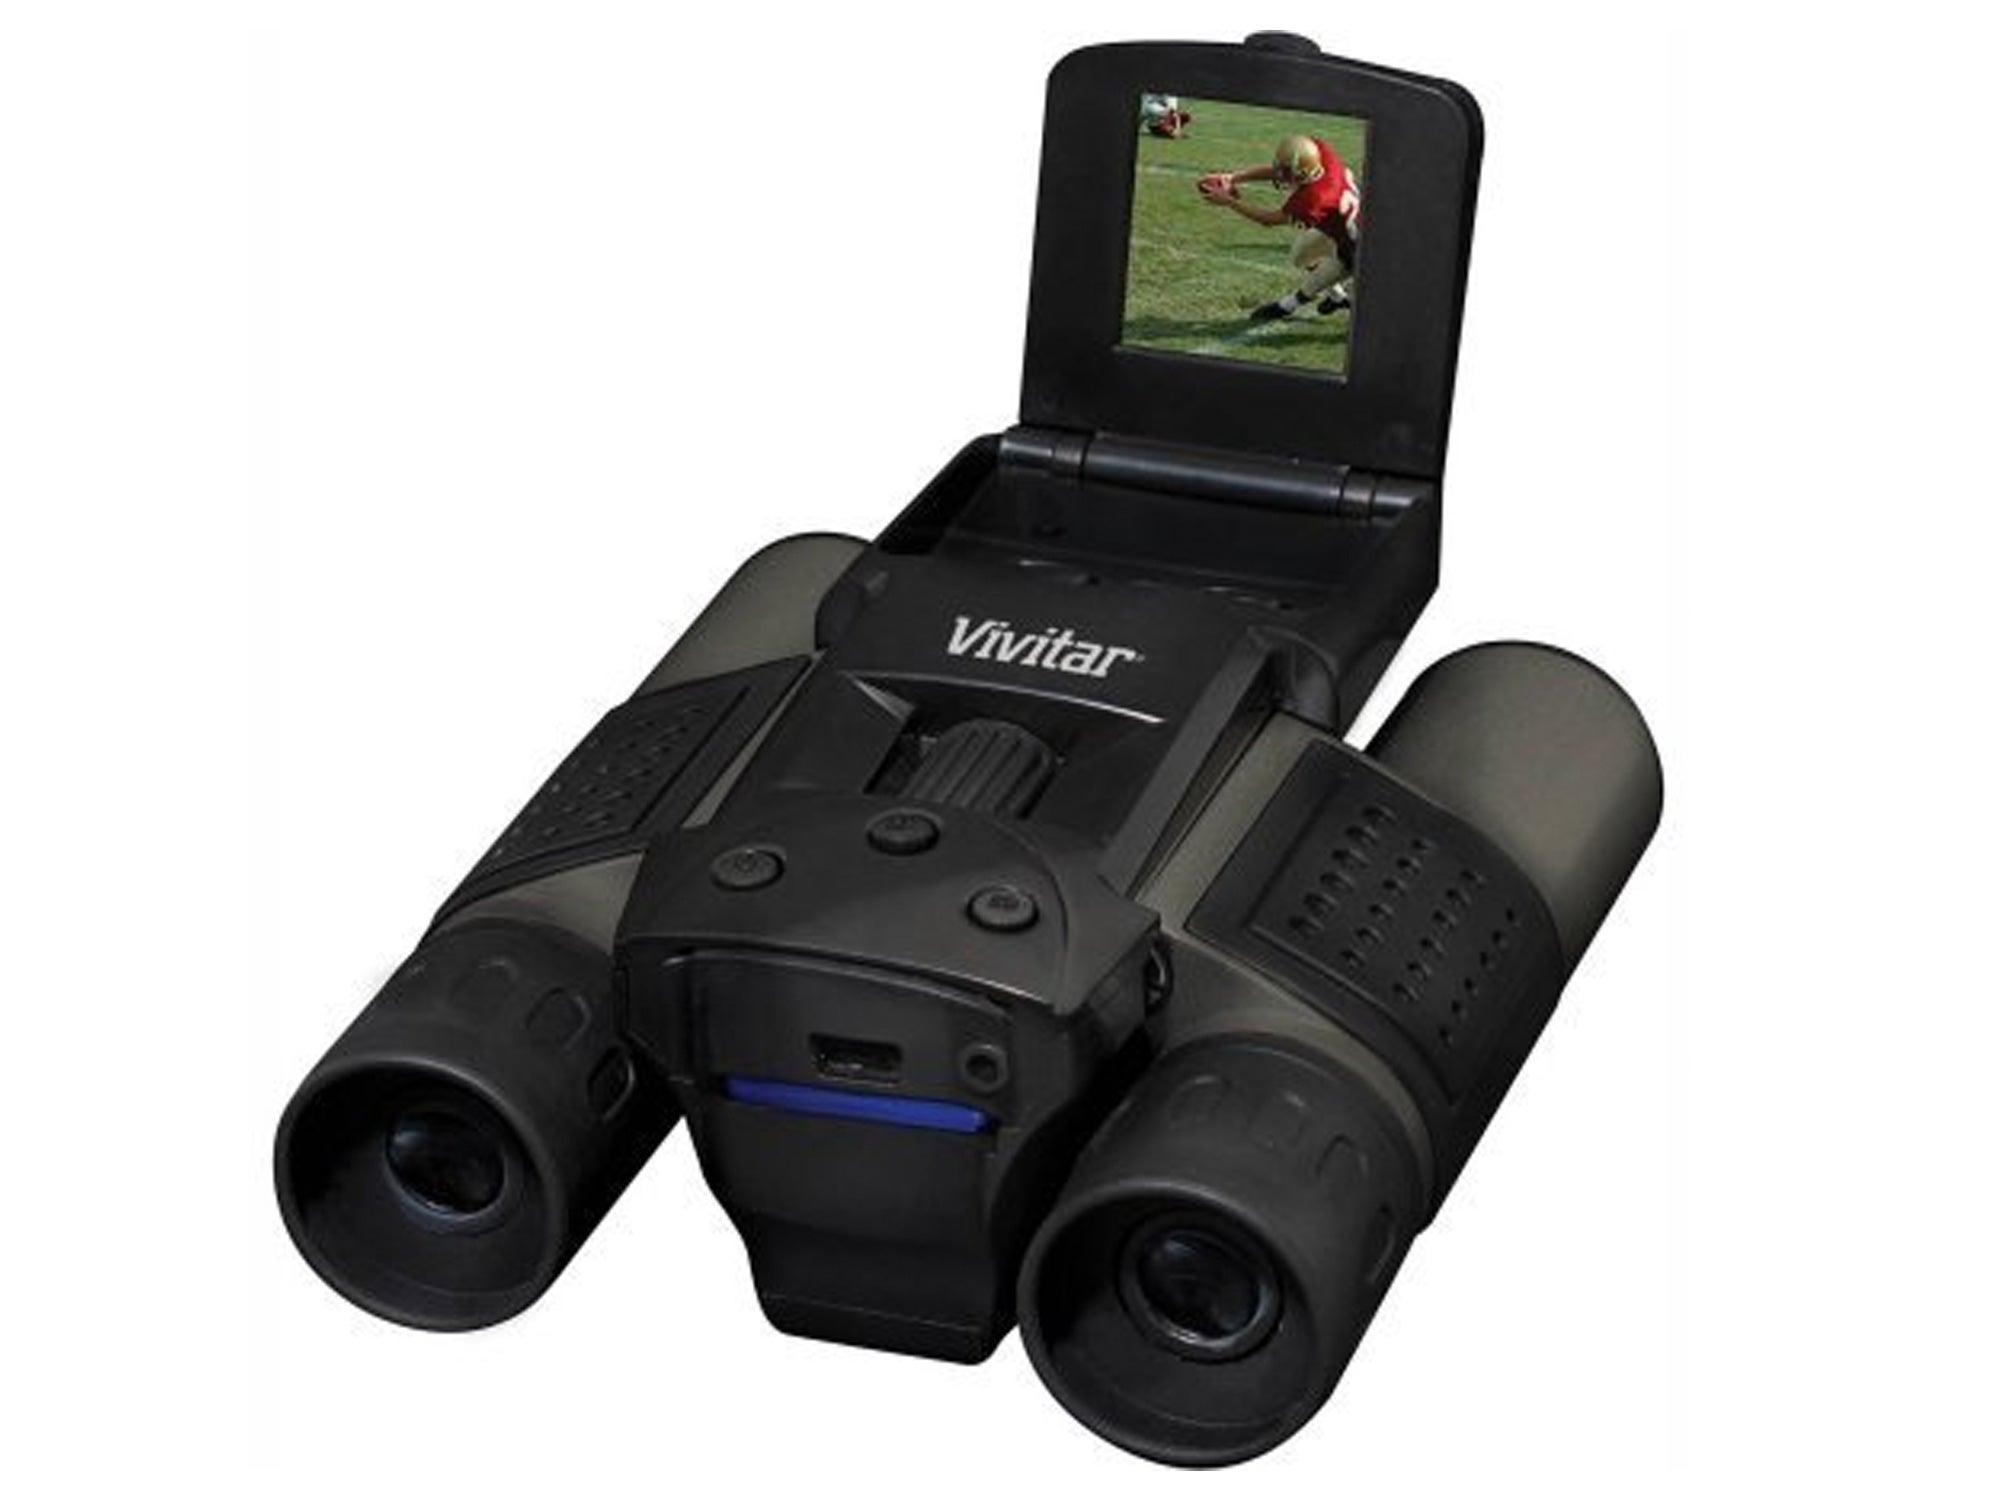 Vivitar Binocular Camera